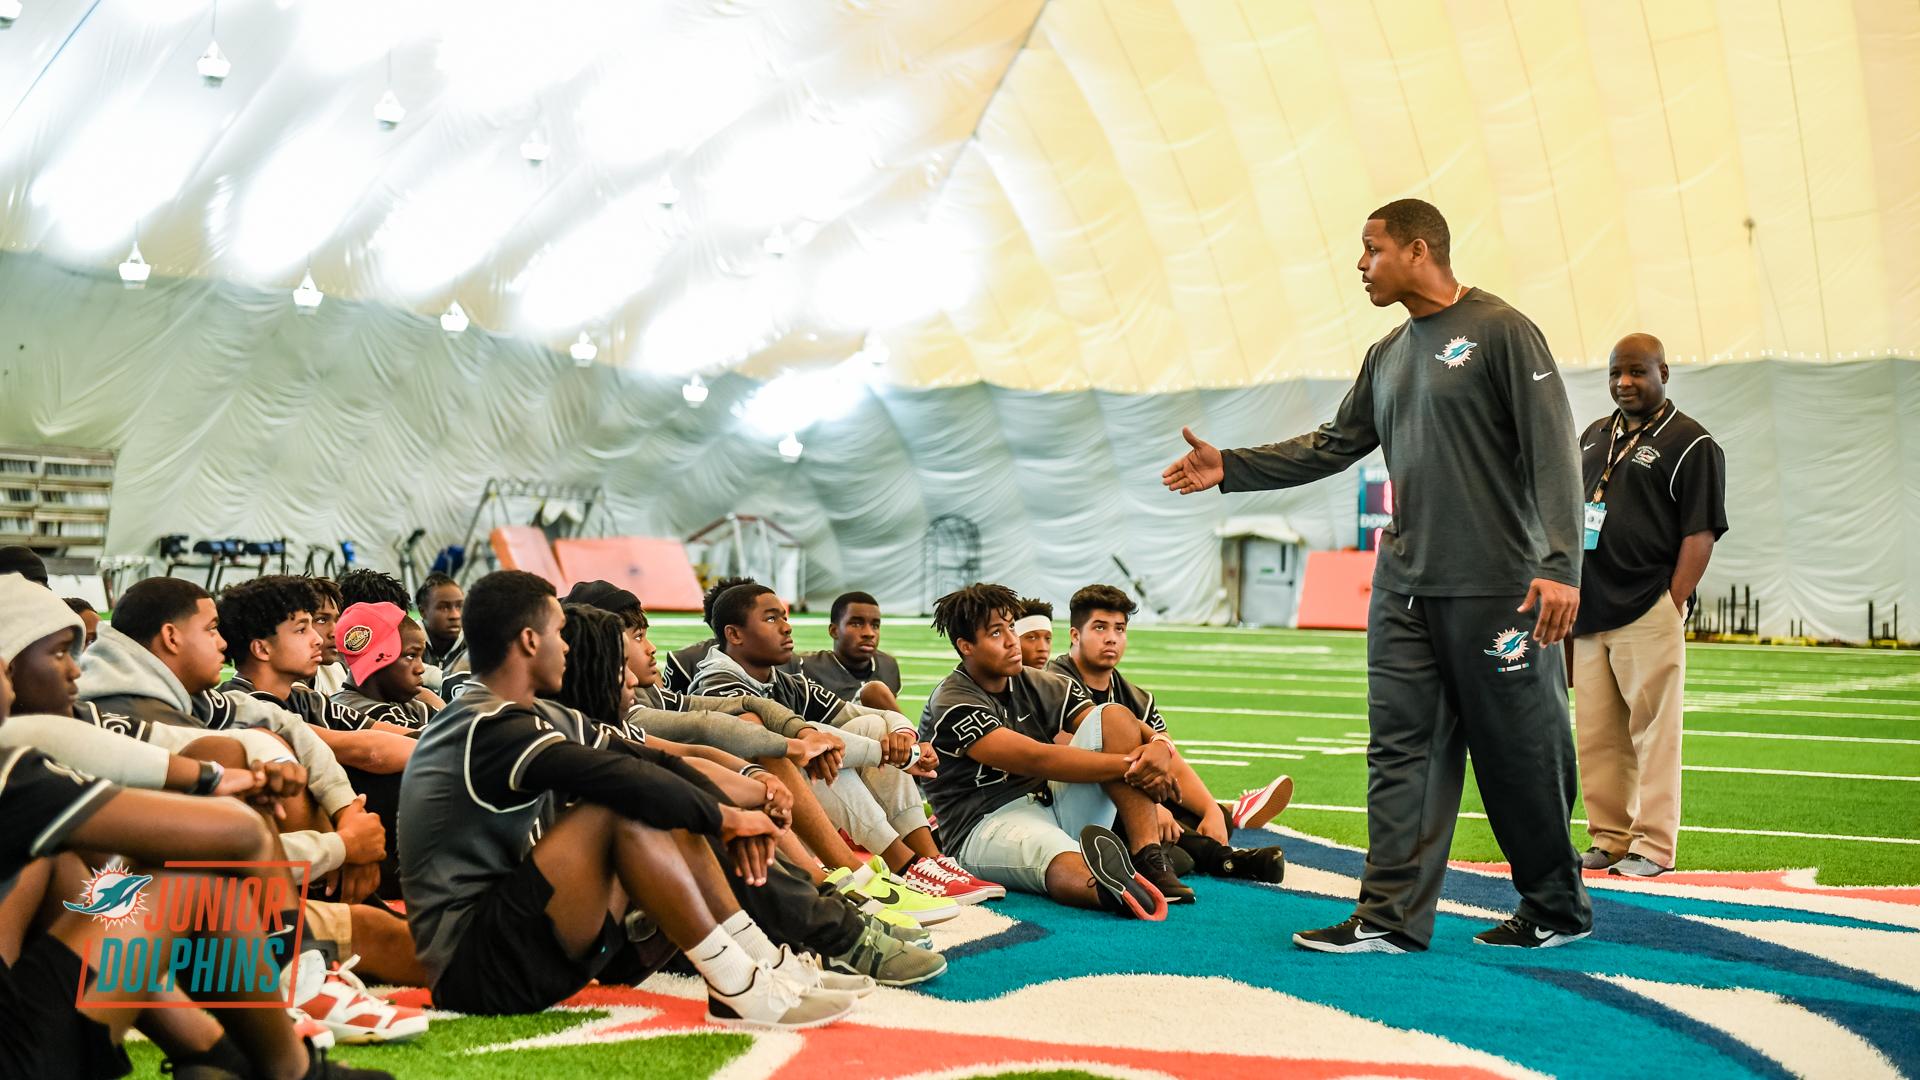 info for c14ec 89e02 Miami Dolphins Youth Programs Ambassador Twan Russell speaks ...